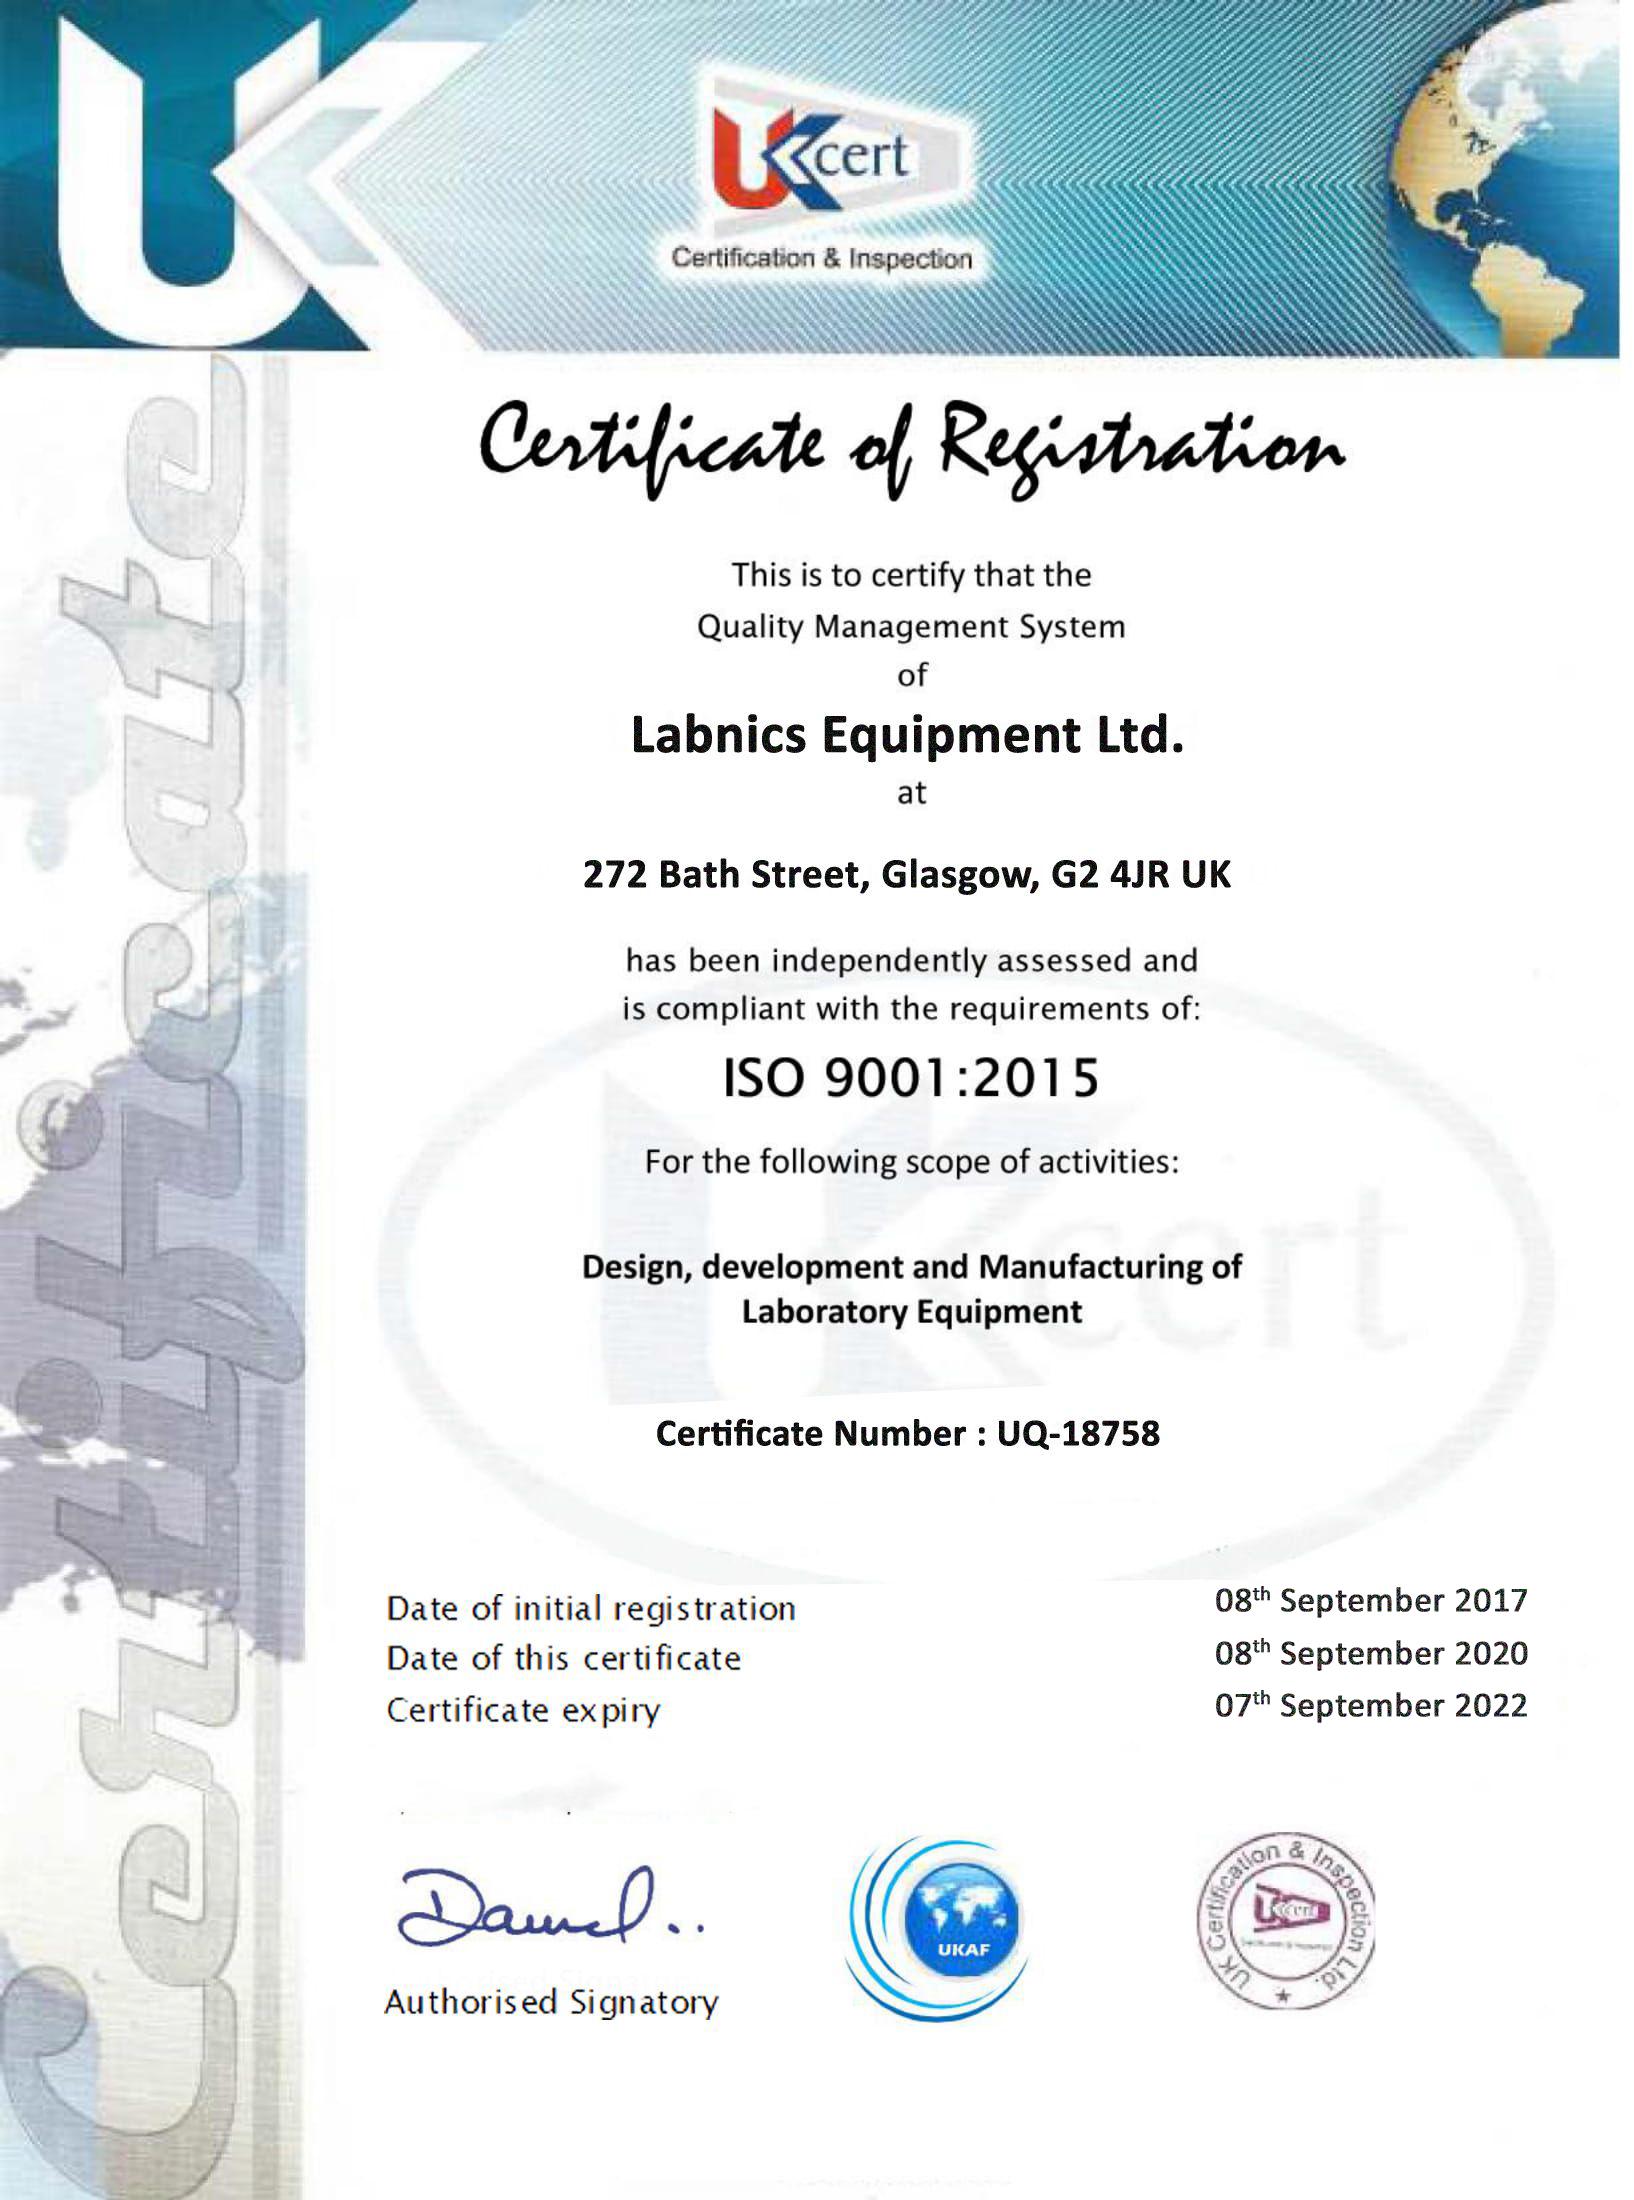 Labnics Equipment Ltd. ISO Certificate